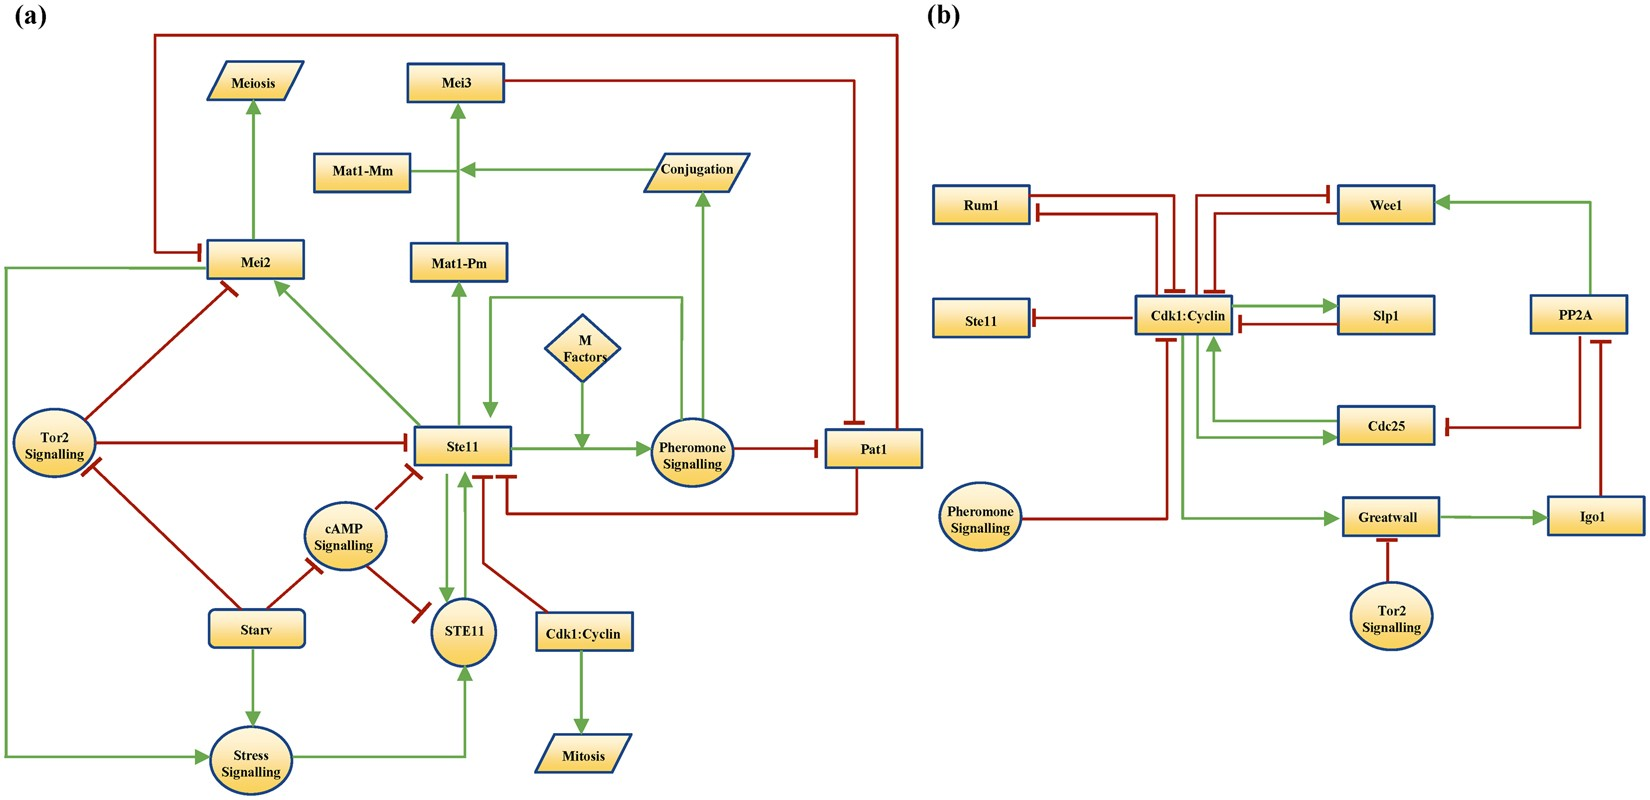 hs22 balboa circuit board wiring diagram wiring diagrams Hot Tub Circuit Board Wiring